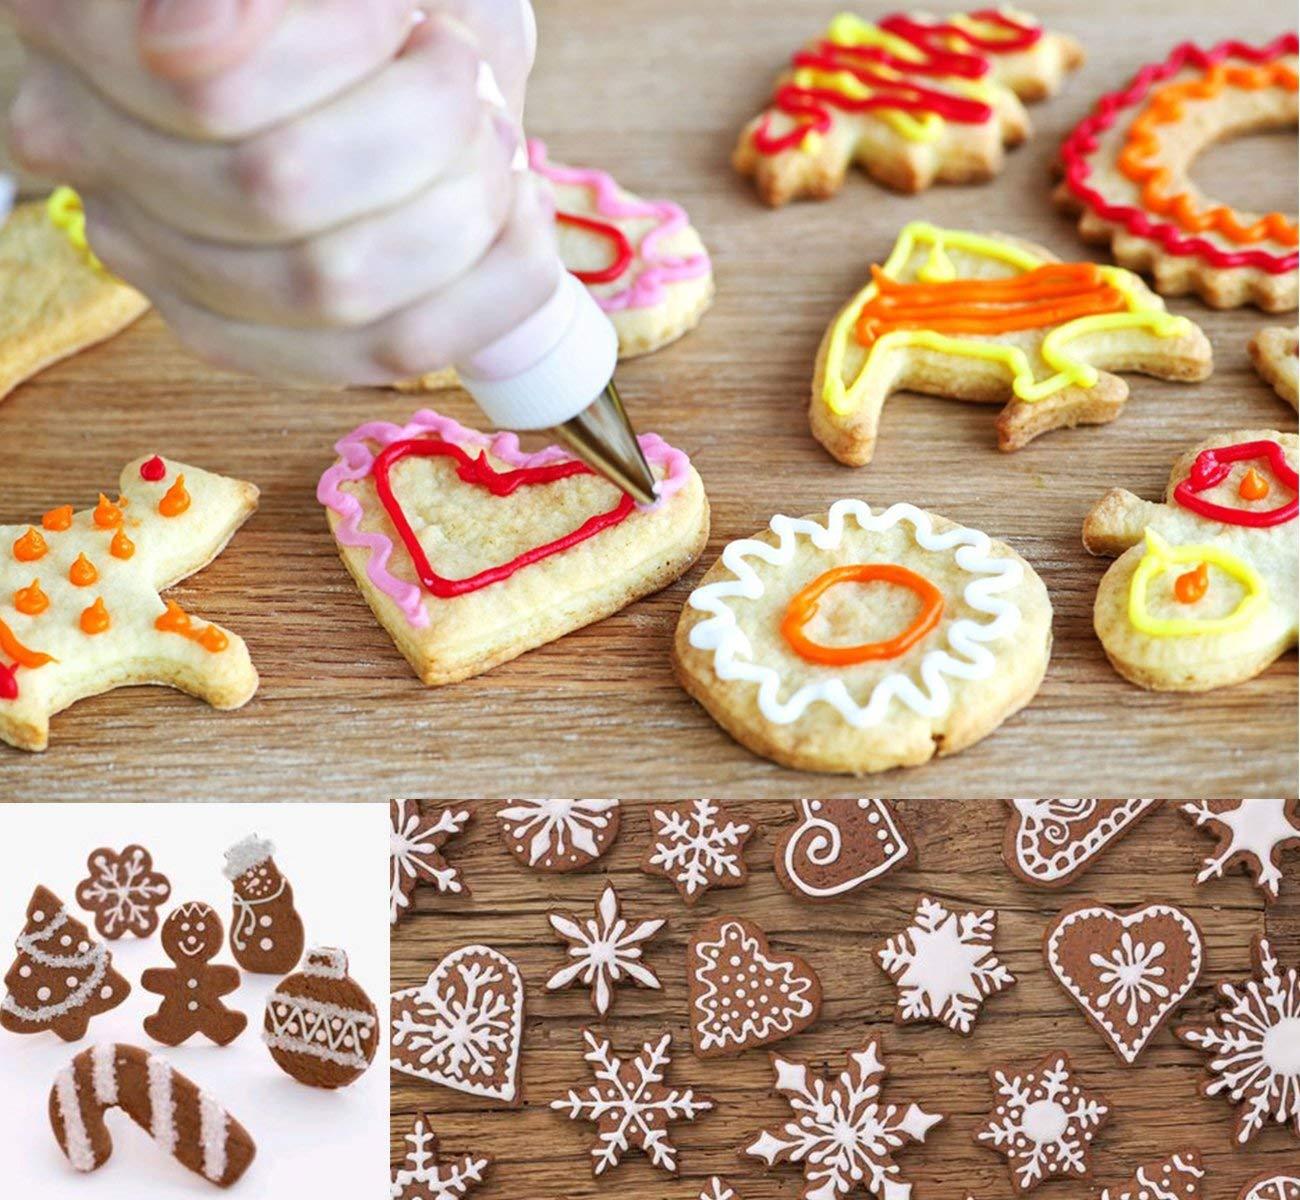 Fondente Biscotti Cupcake e Macaron CHENs sac à Poche da ...